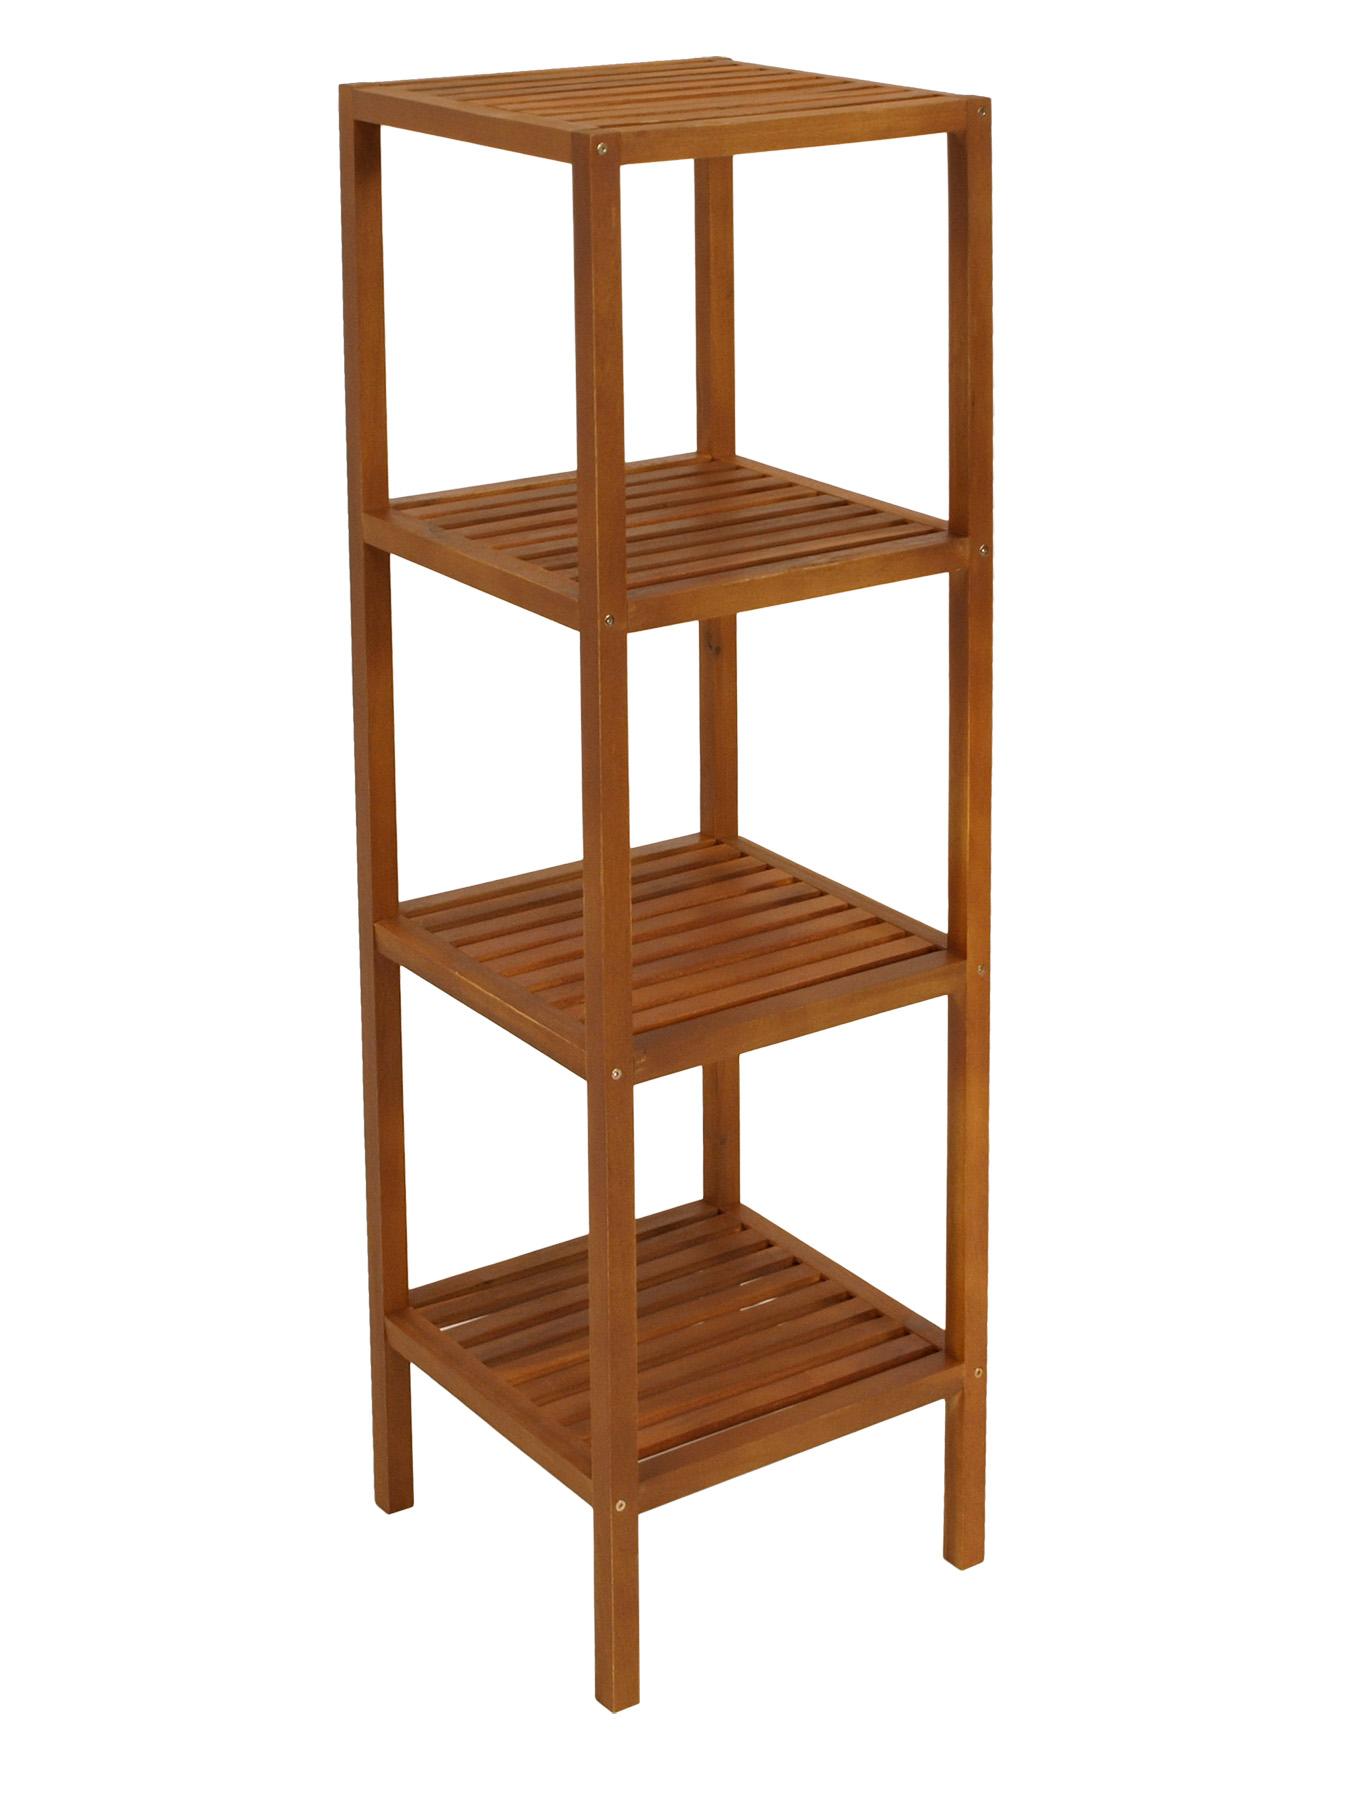 regal holzregal b cherregal holz akazie wetterfest 35x35x118cm innen und au en ebay. Black Bedroom Furniture Sets. Home Design Ideas